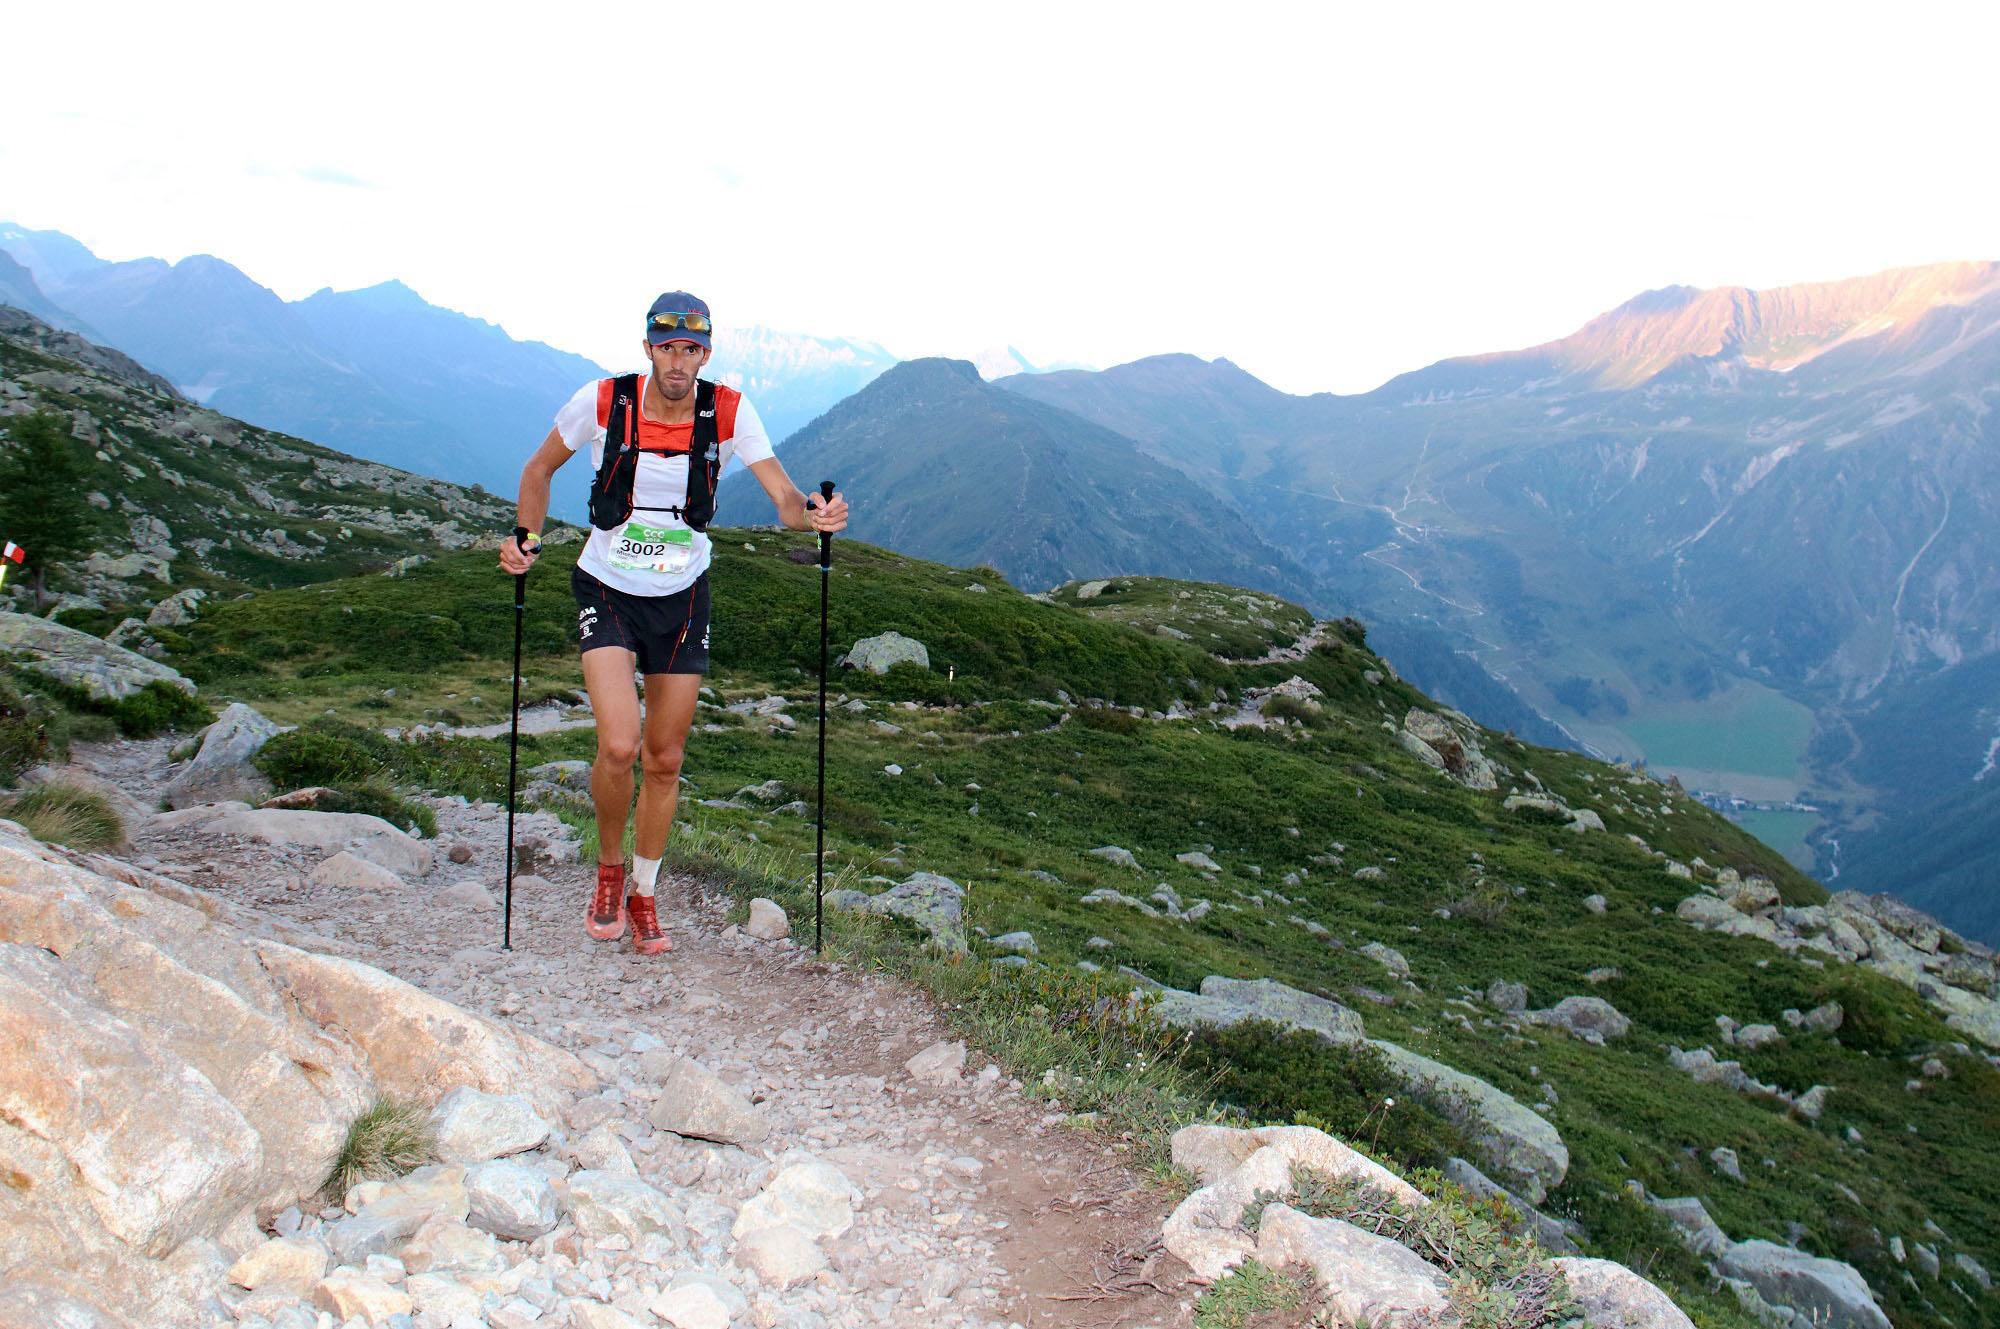 1-michel-lanne-ccc-2016-photo-goran-mojicevic-passion-trail